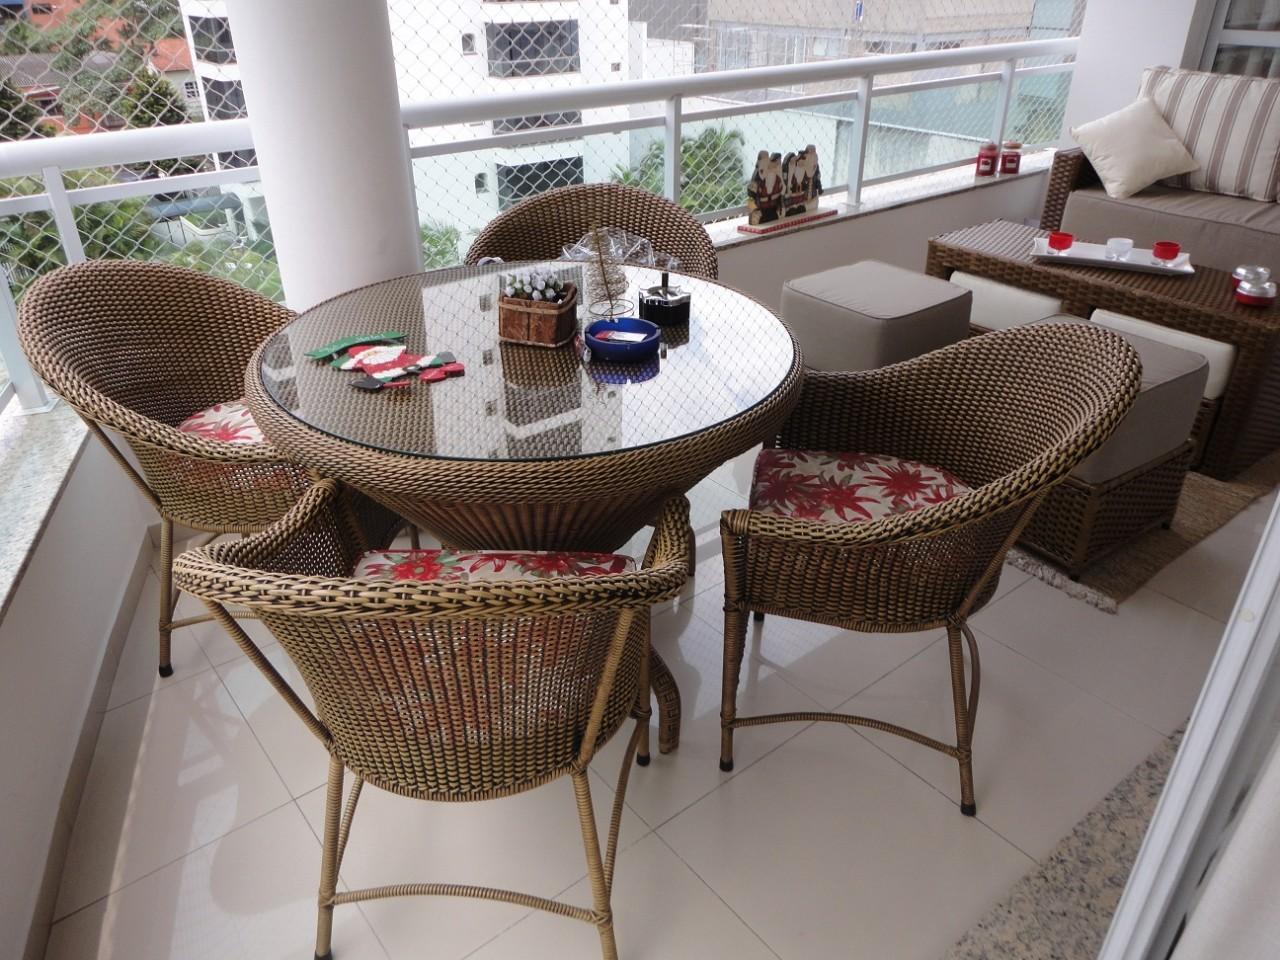 Conjunto de 4 cadeiras e base de mesa em fibra sintetica. #372820 1280x960